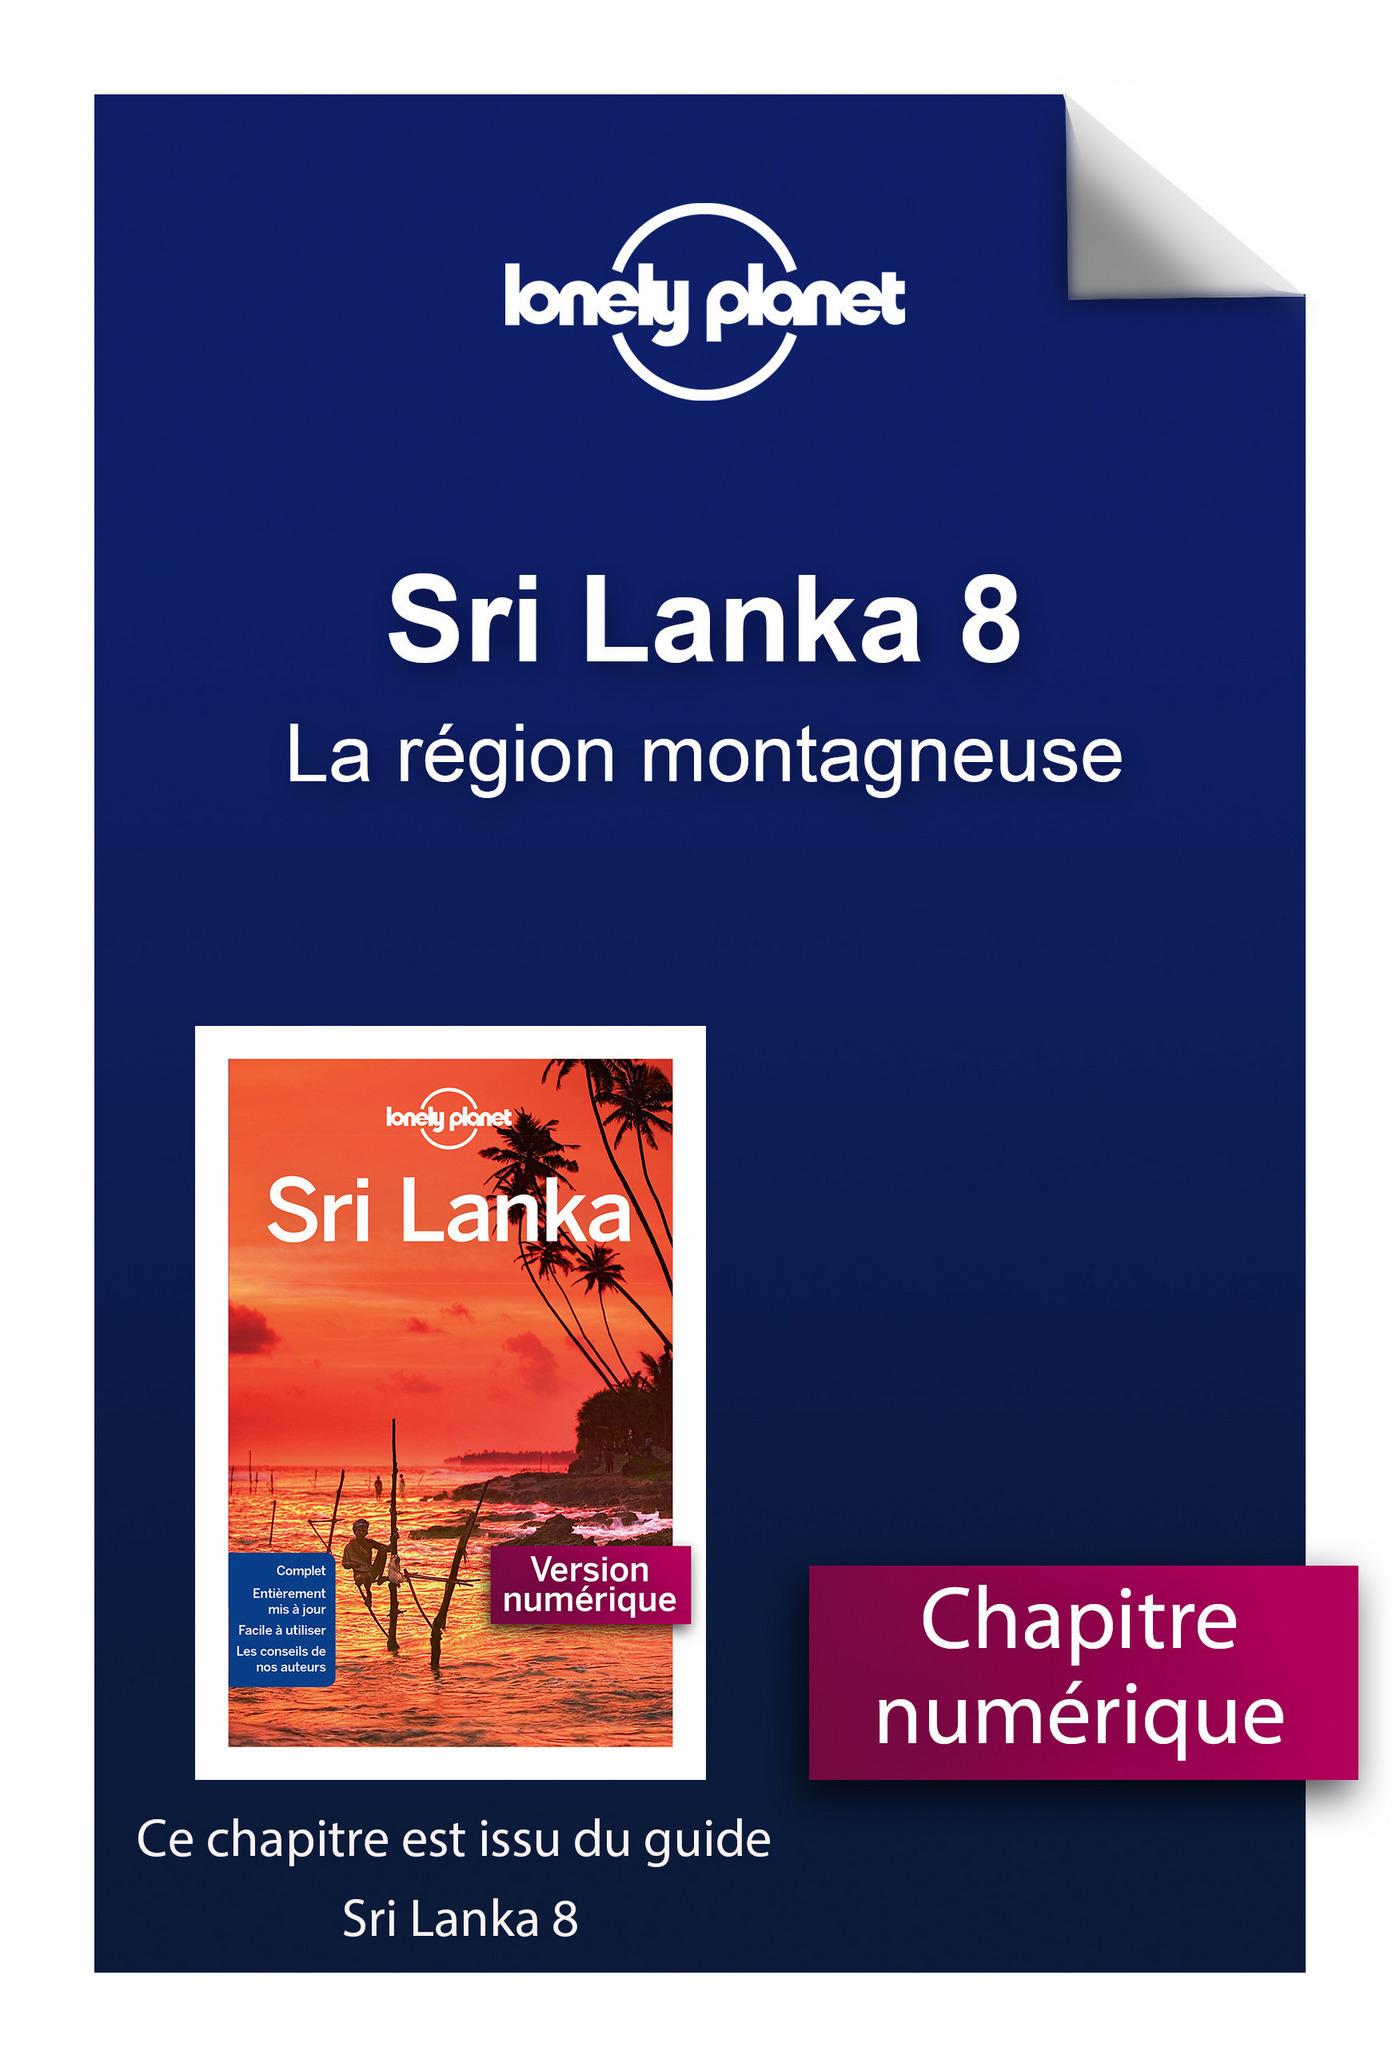 Sri Lanka - La région montagneuse